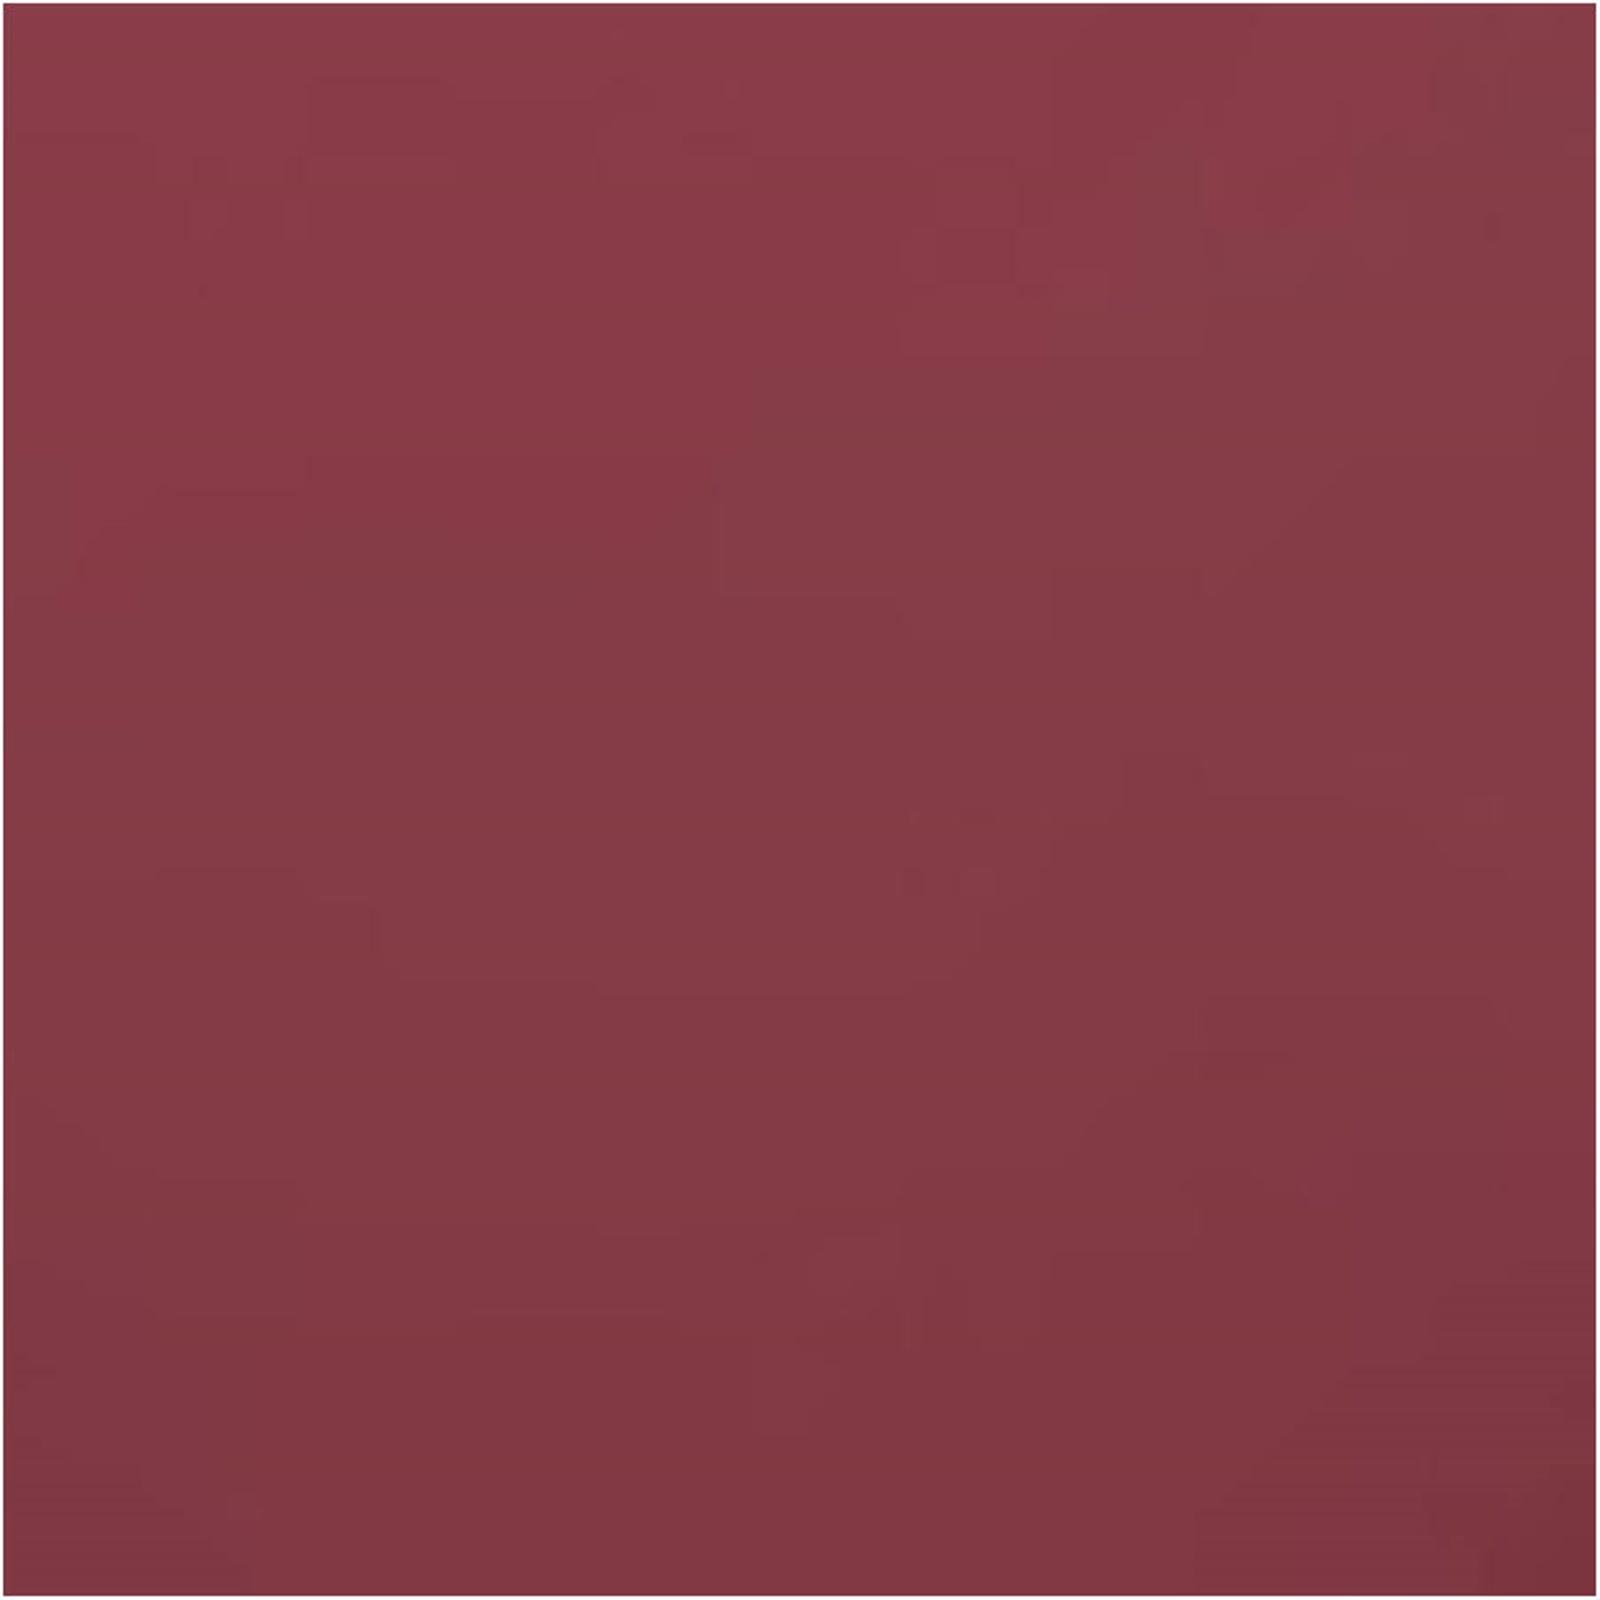 decor soft rosu cardinal